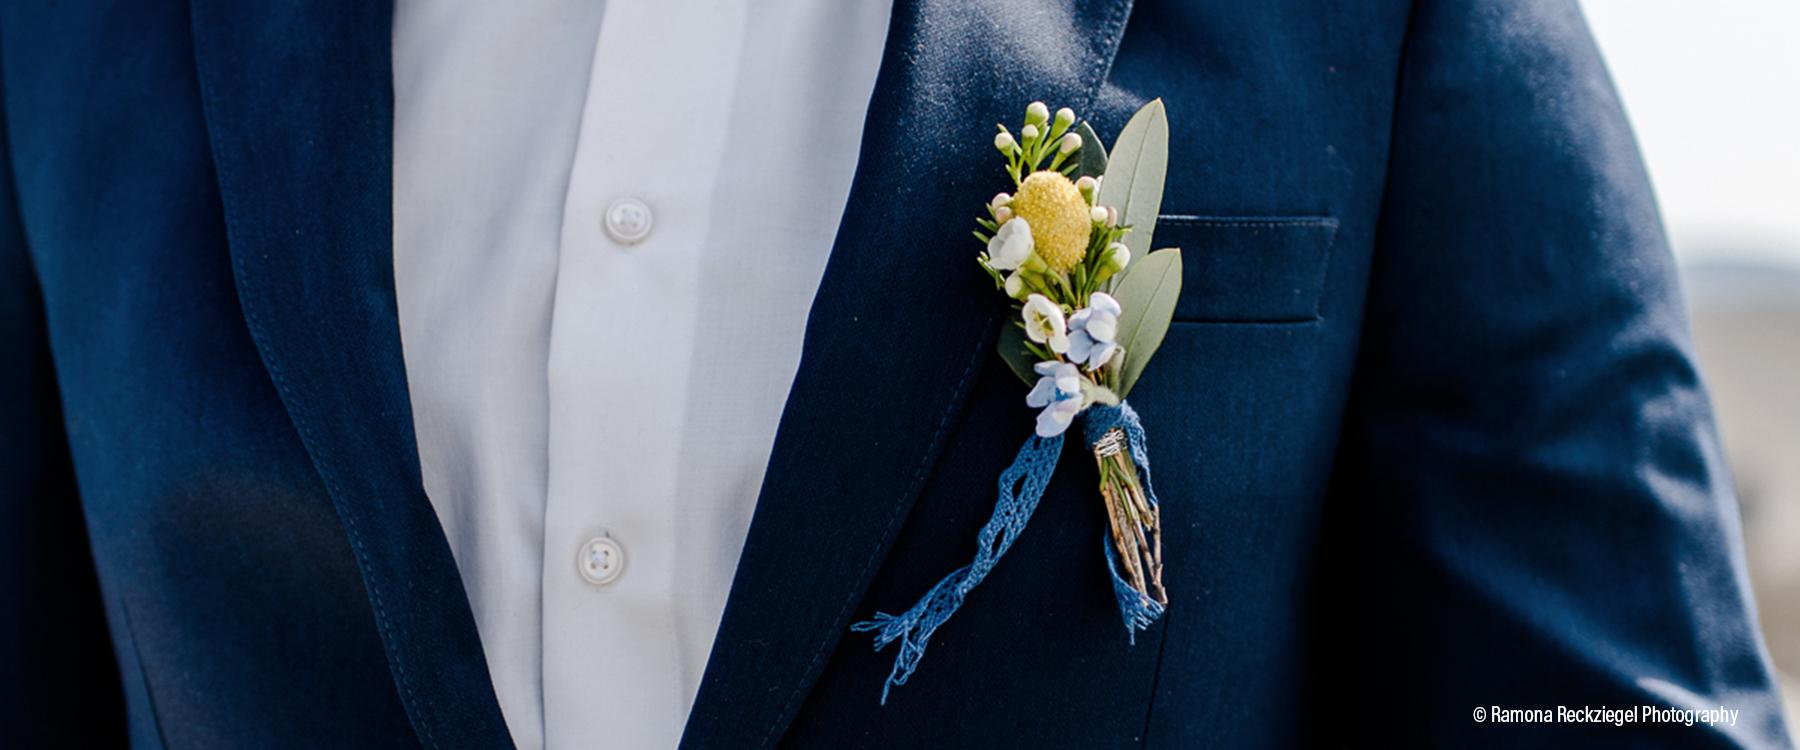 wedding-fotos-cinema-rrp-0580.jpg